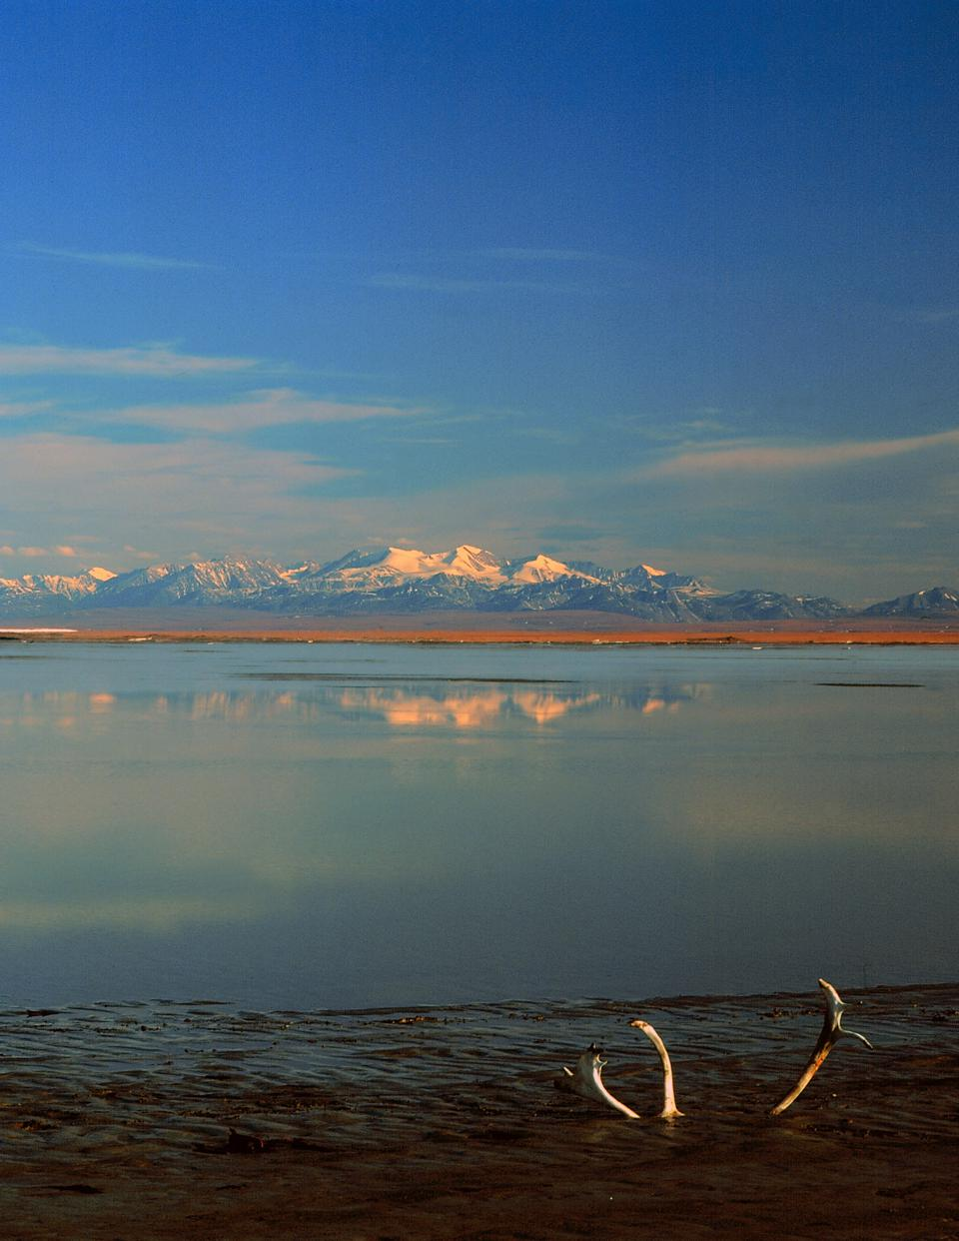 Coastal Plain from Hulahula Delta, ANWR, Alaska